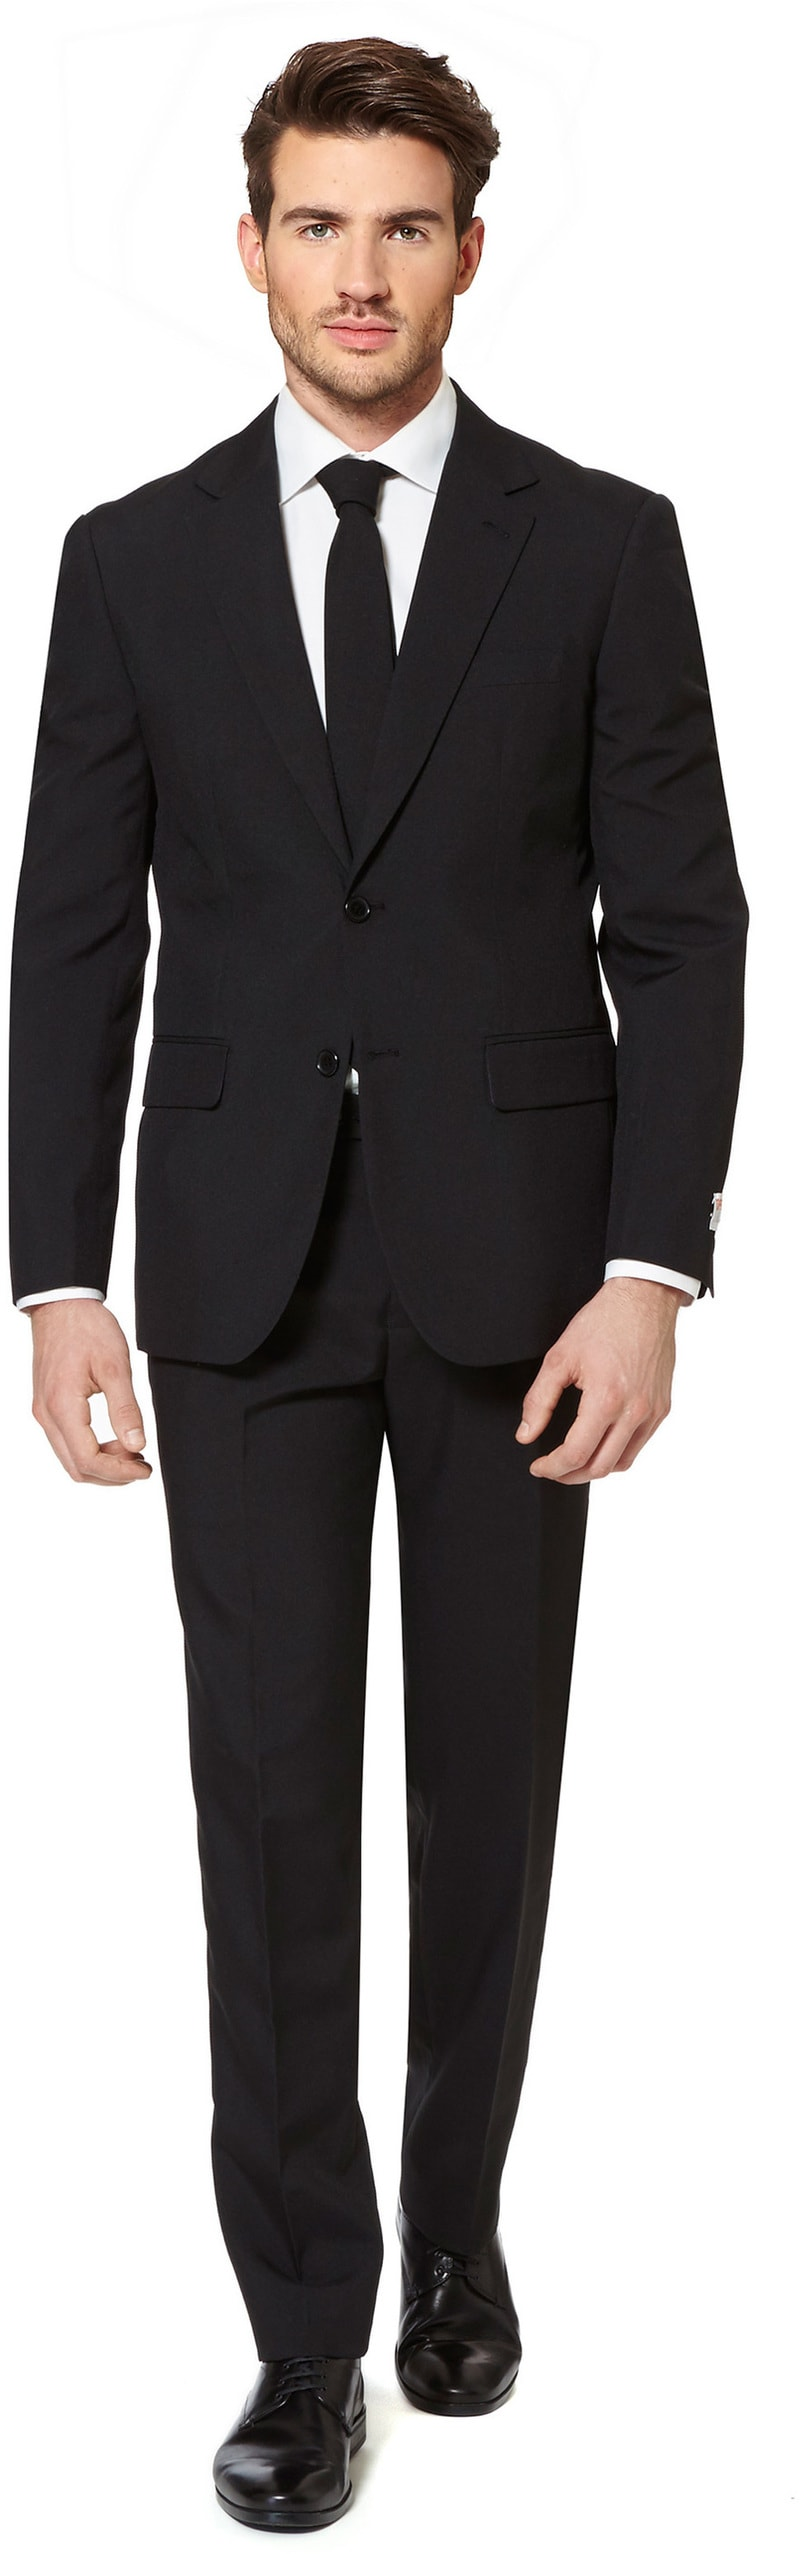 OppoSuits Black Knight Kostuum  online bestellen | Suitable